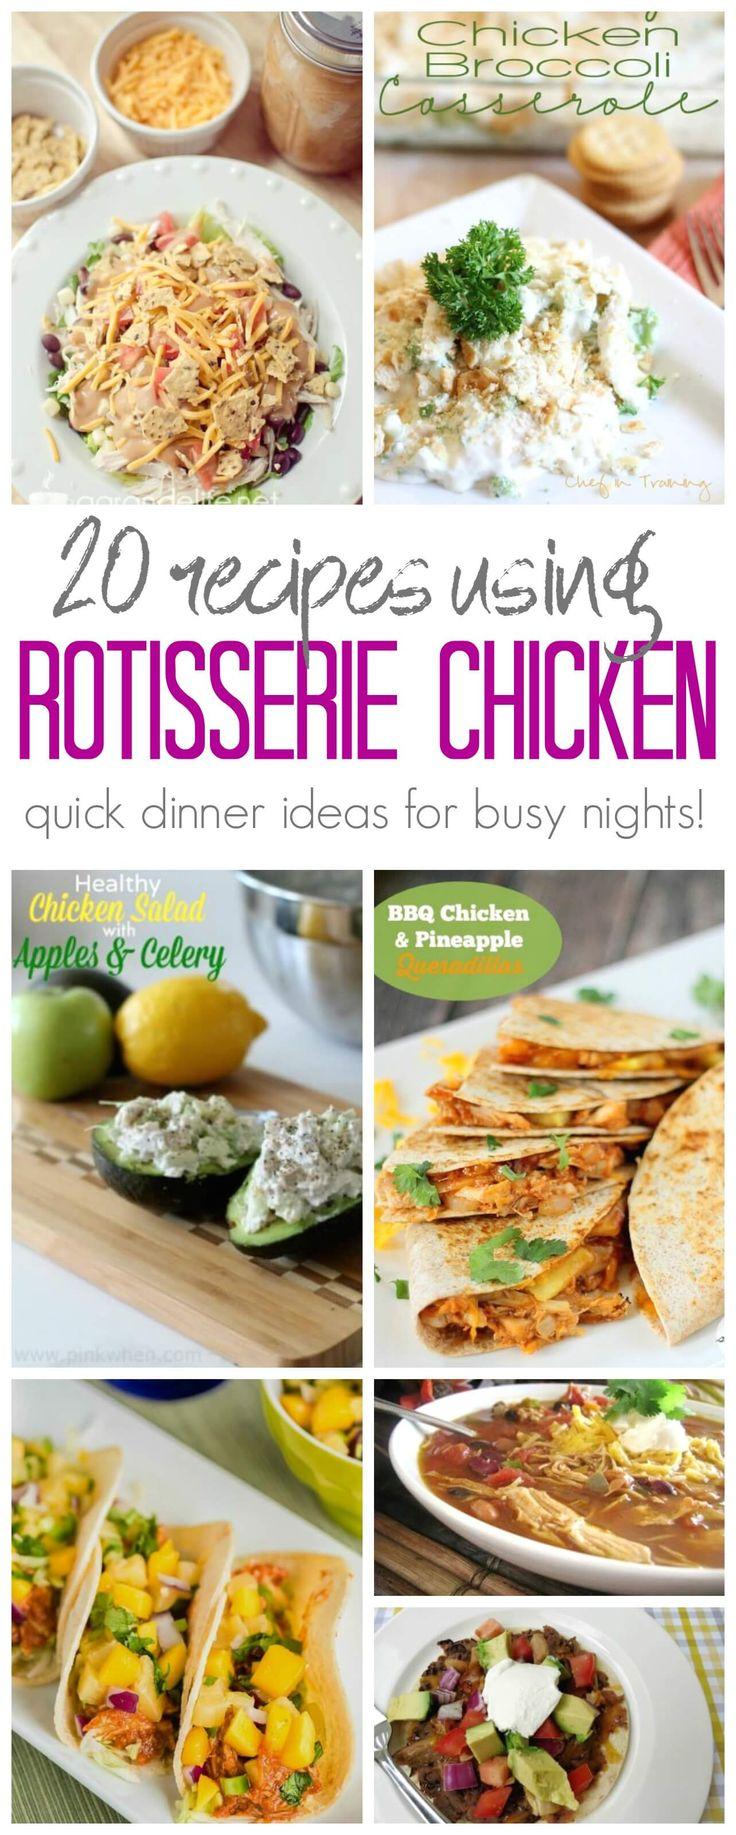 Best 25 Leftover Rotisserie Chicken Ideas On Pinterest -7283